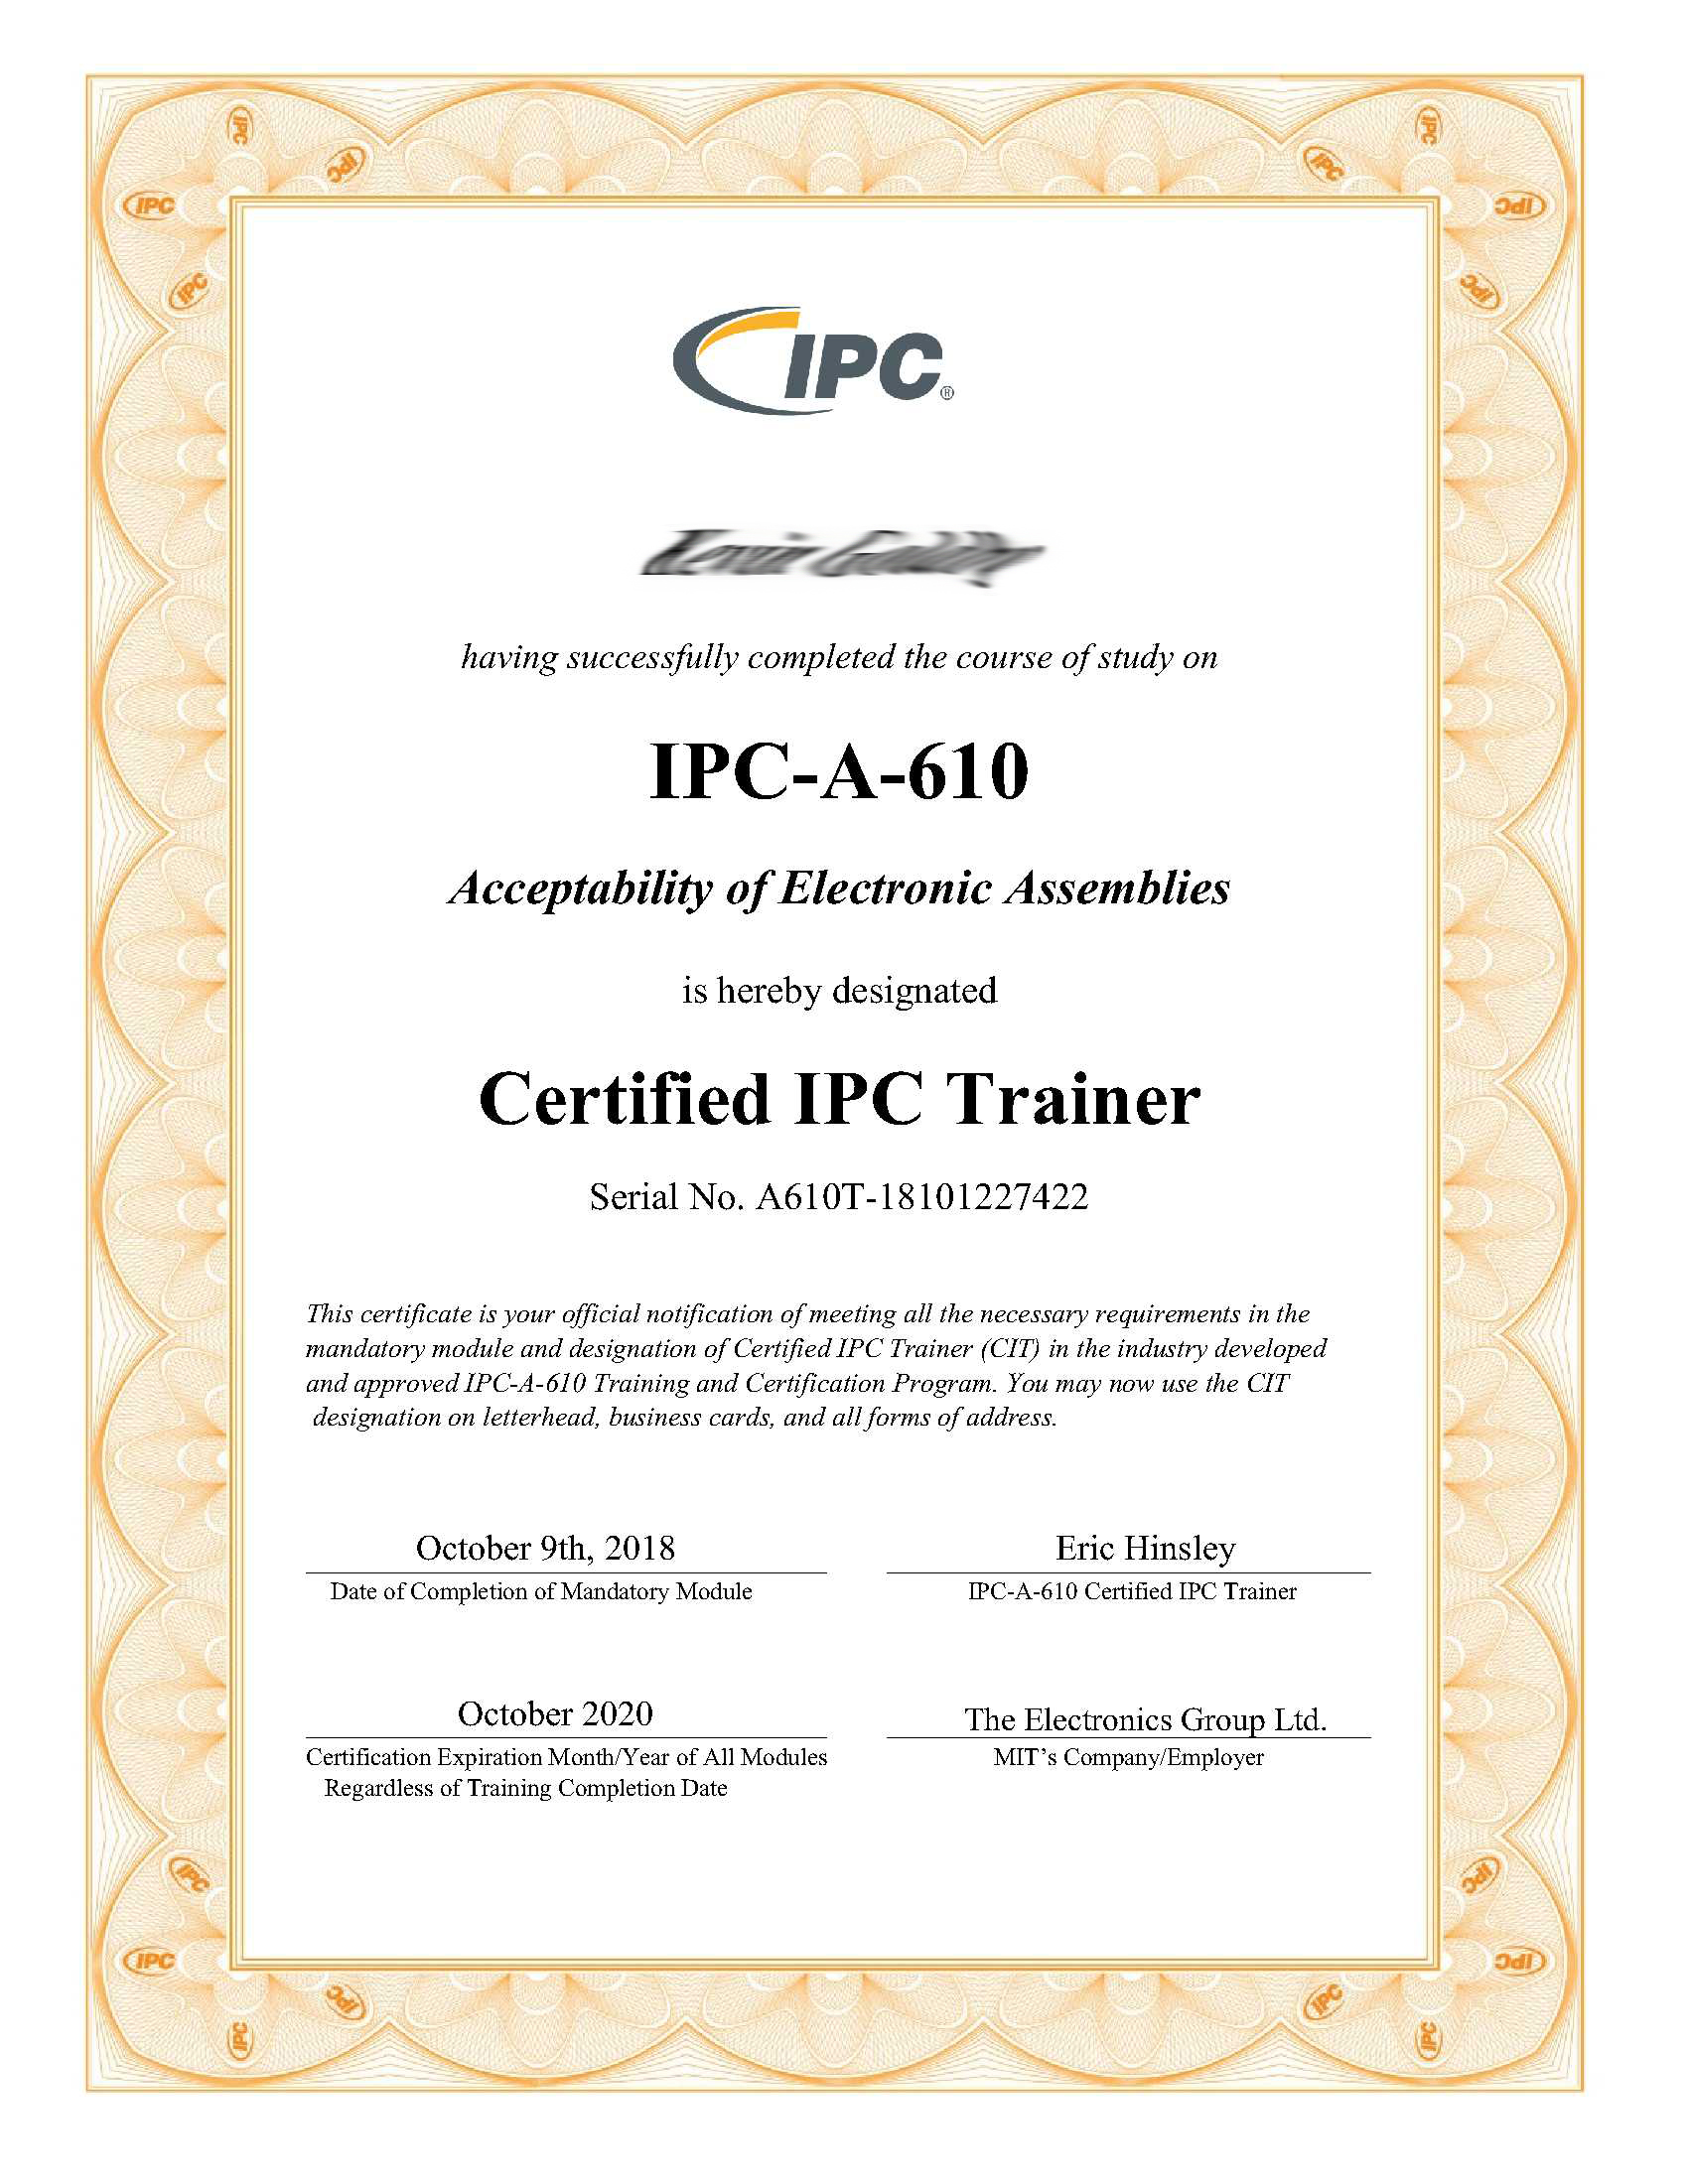 Cleveland Circuits IPC-A-610 Certificate